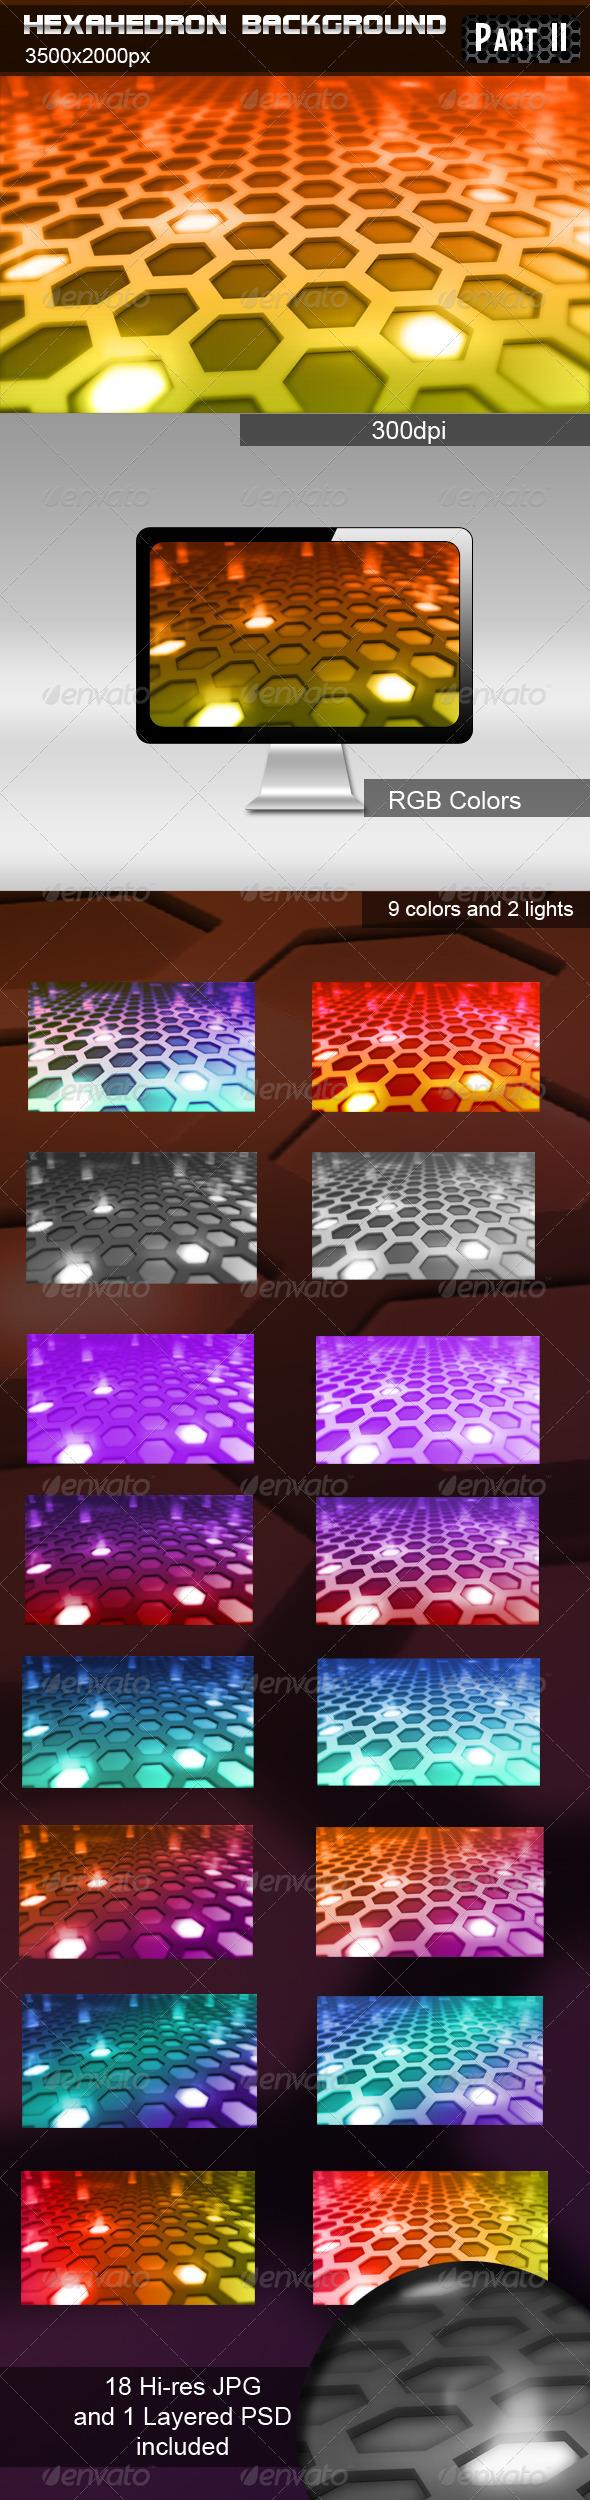 Hexahedron Background part 2 - Tech / Futuristic Backgrounds